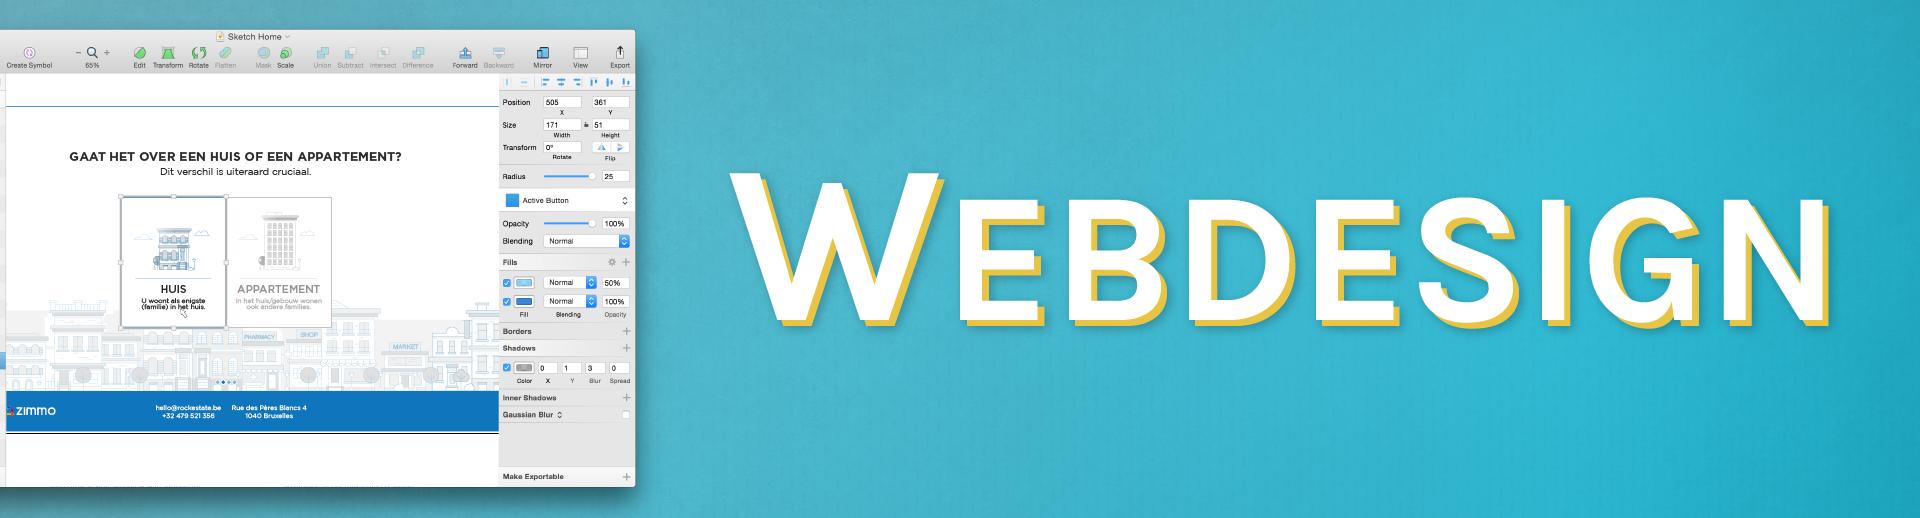 Webdesign_thumbnail